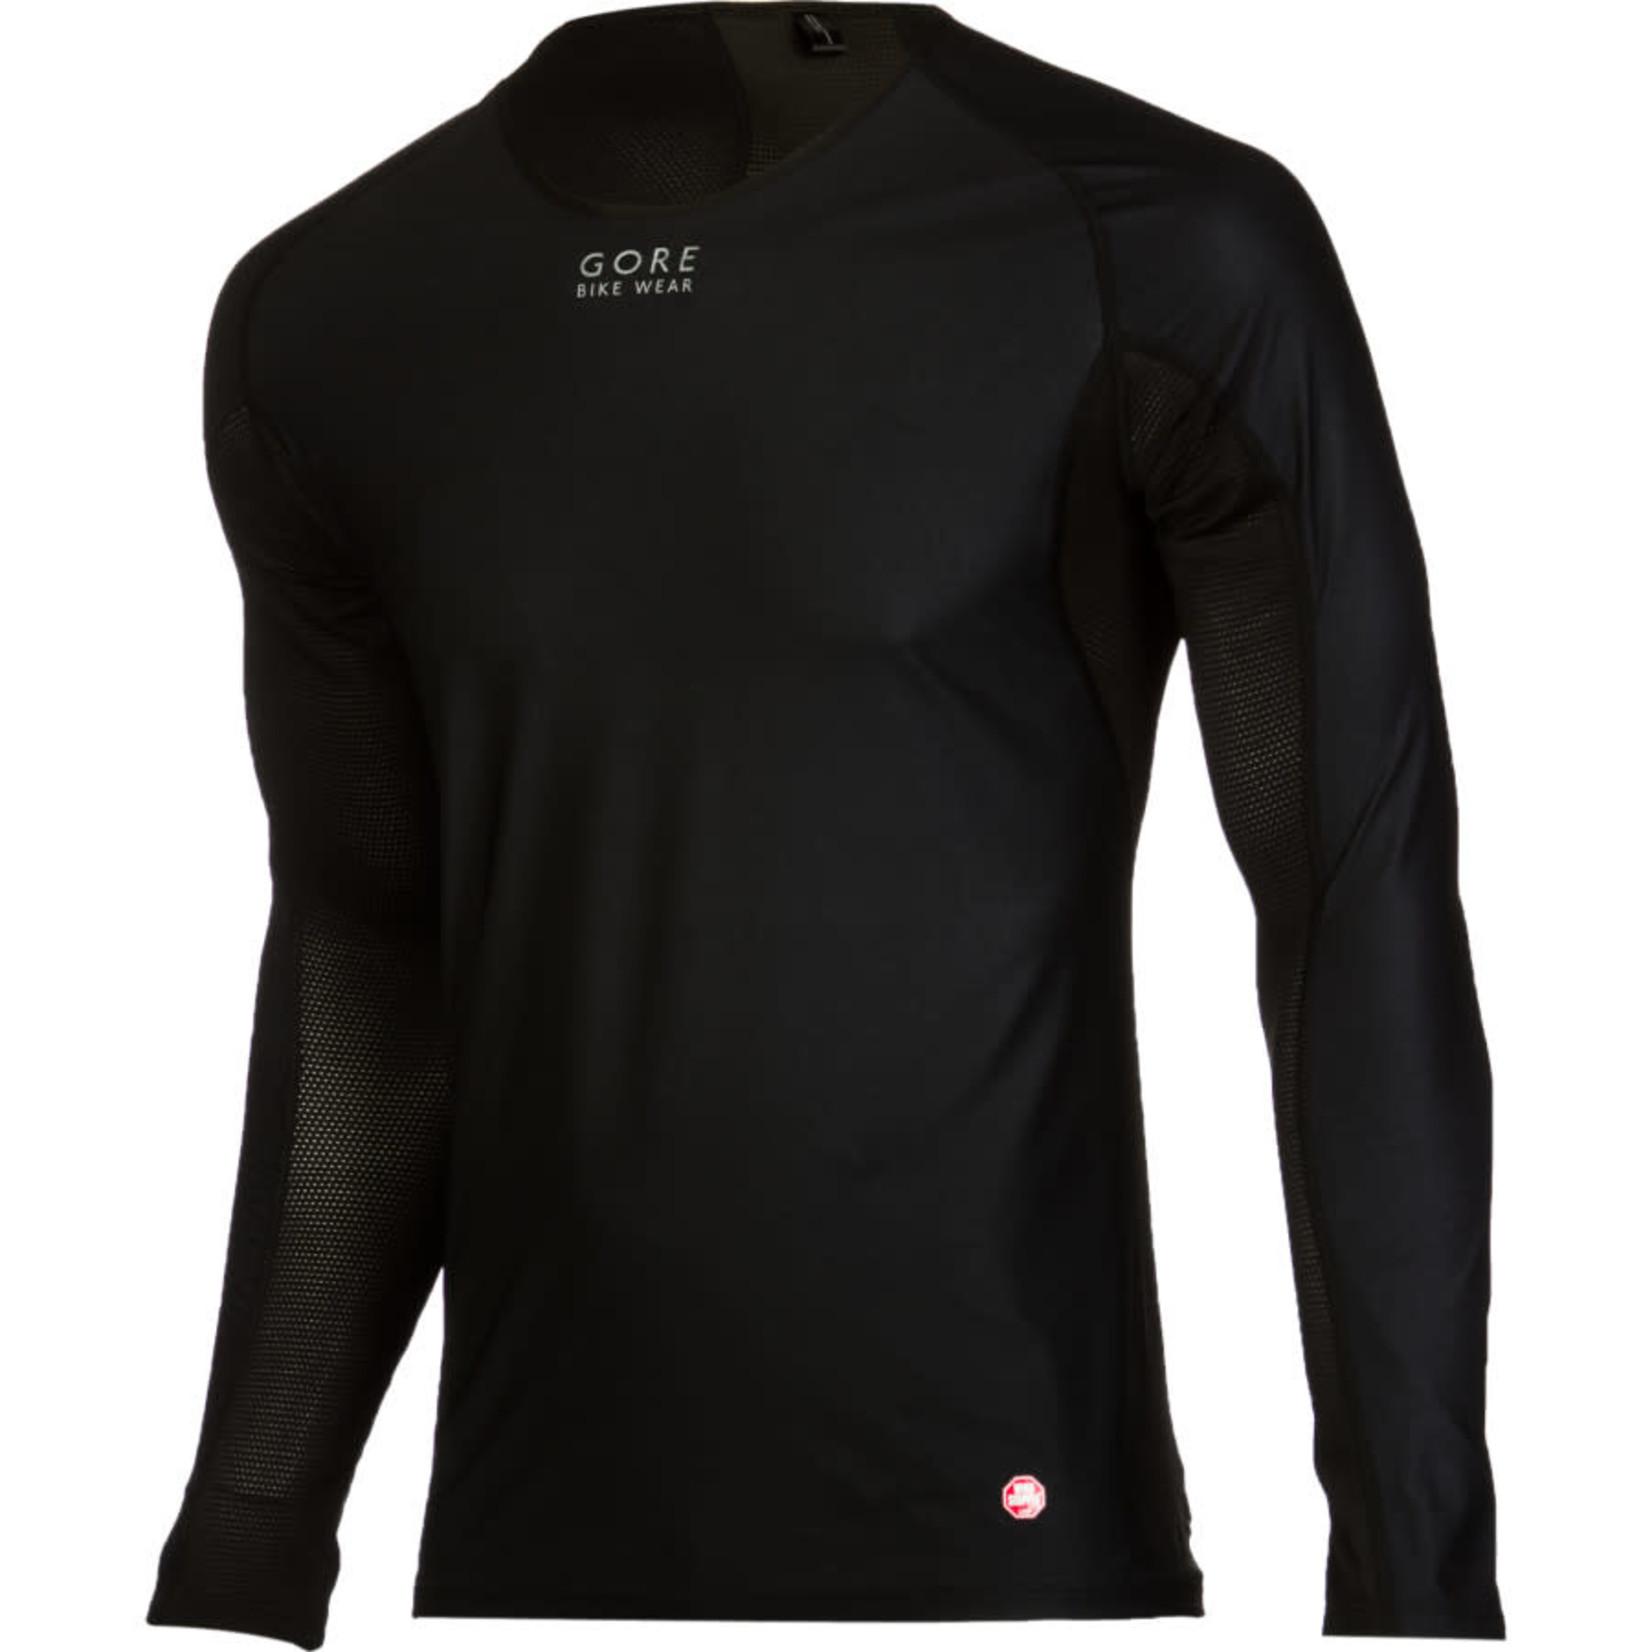 Gore Gore Base Layer Windstopper Shirt Long